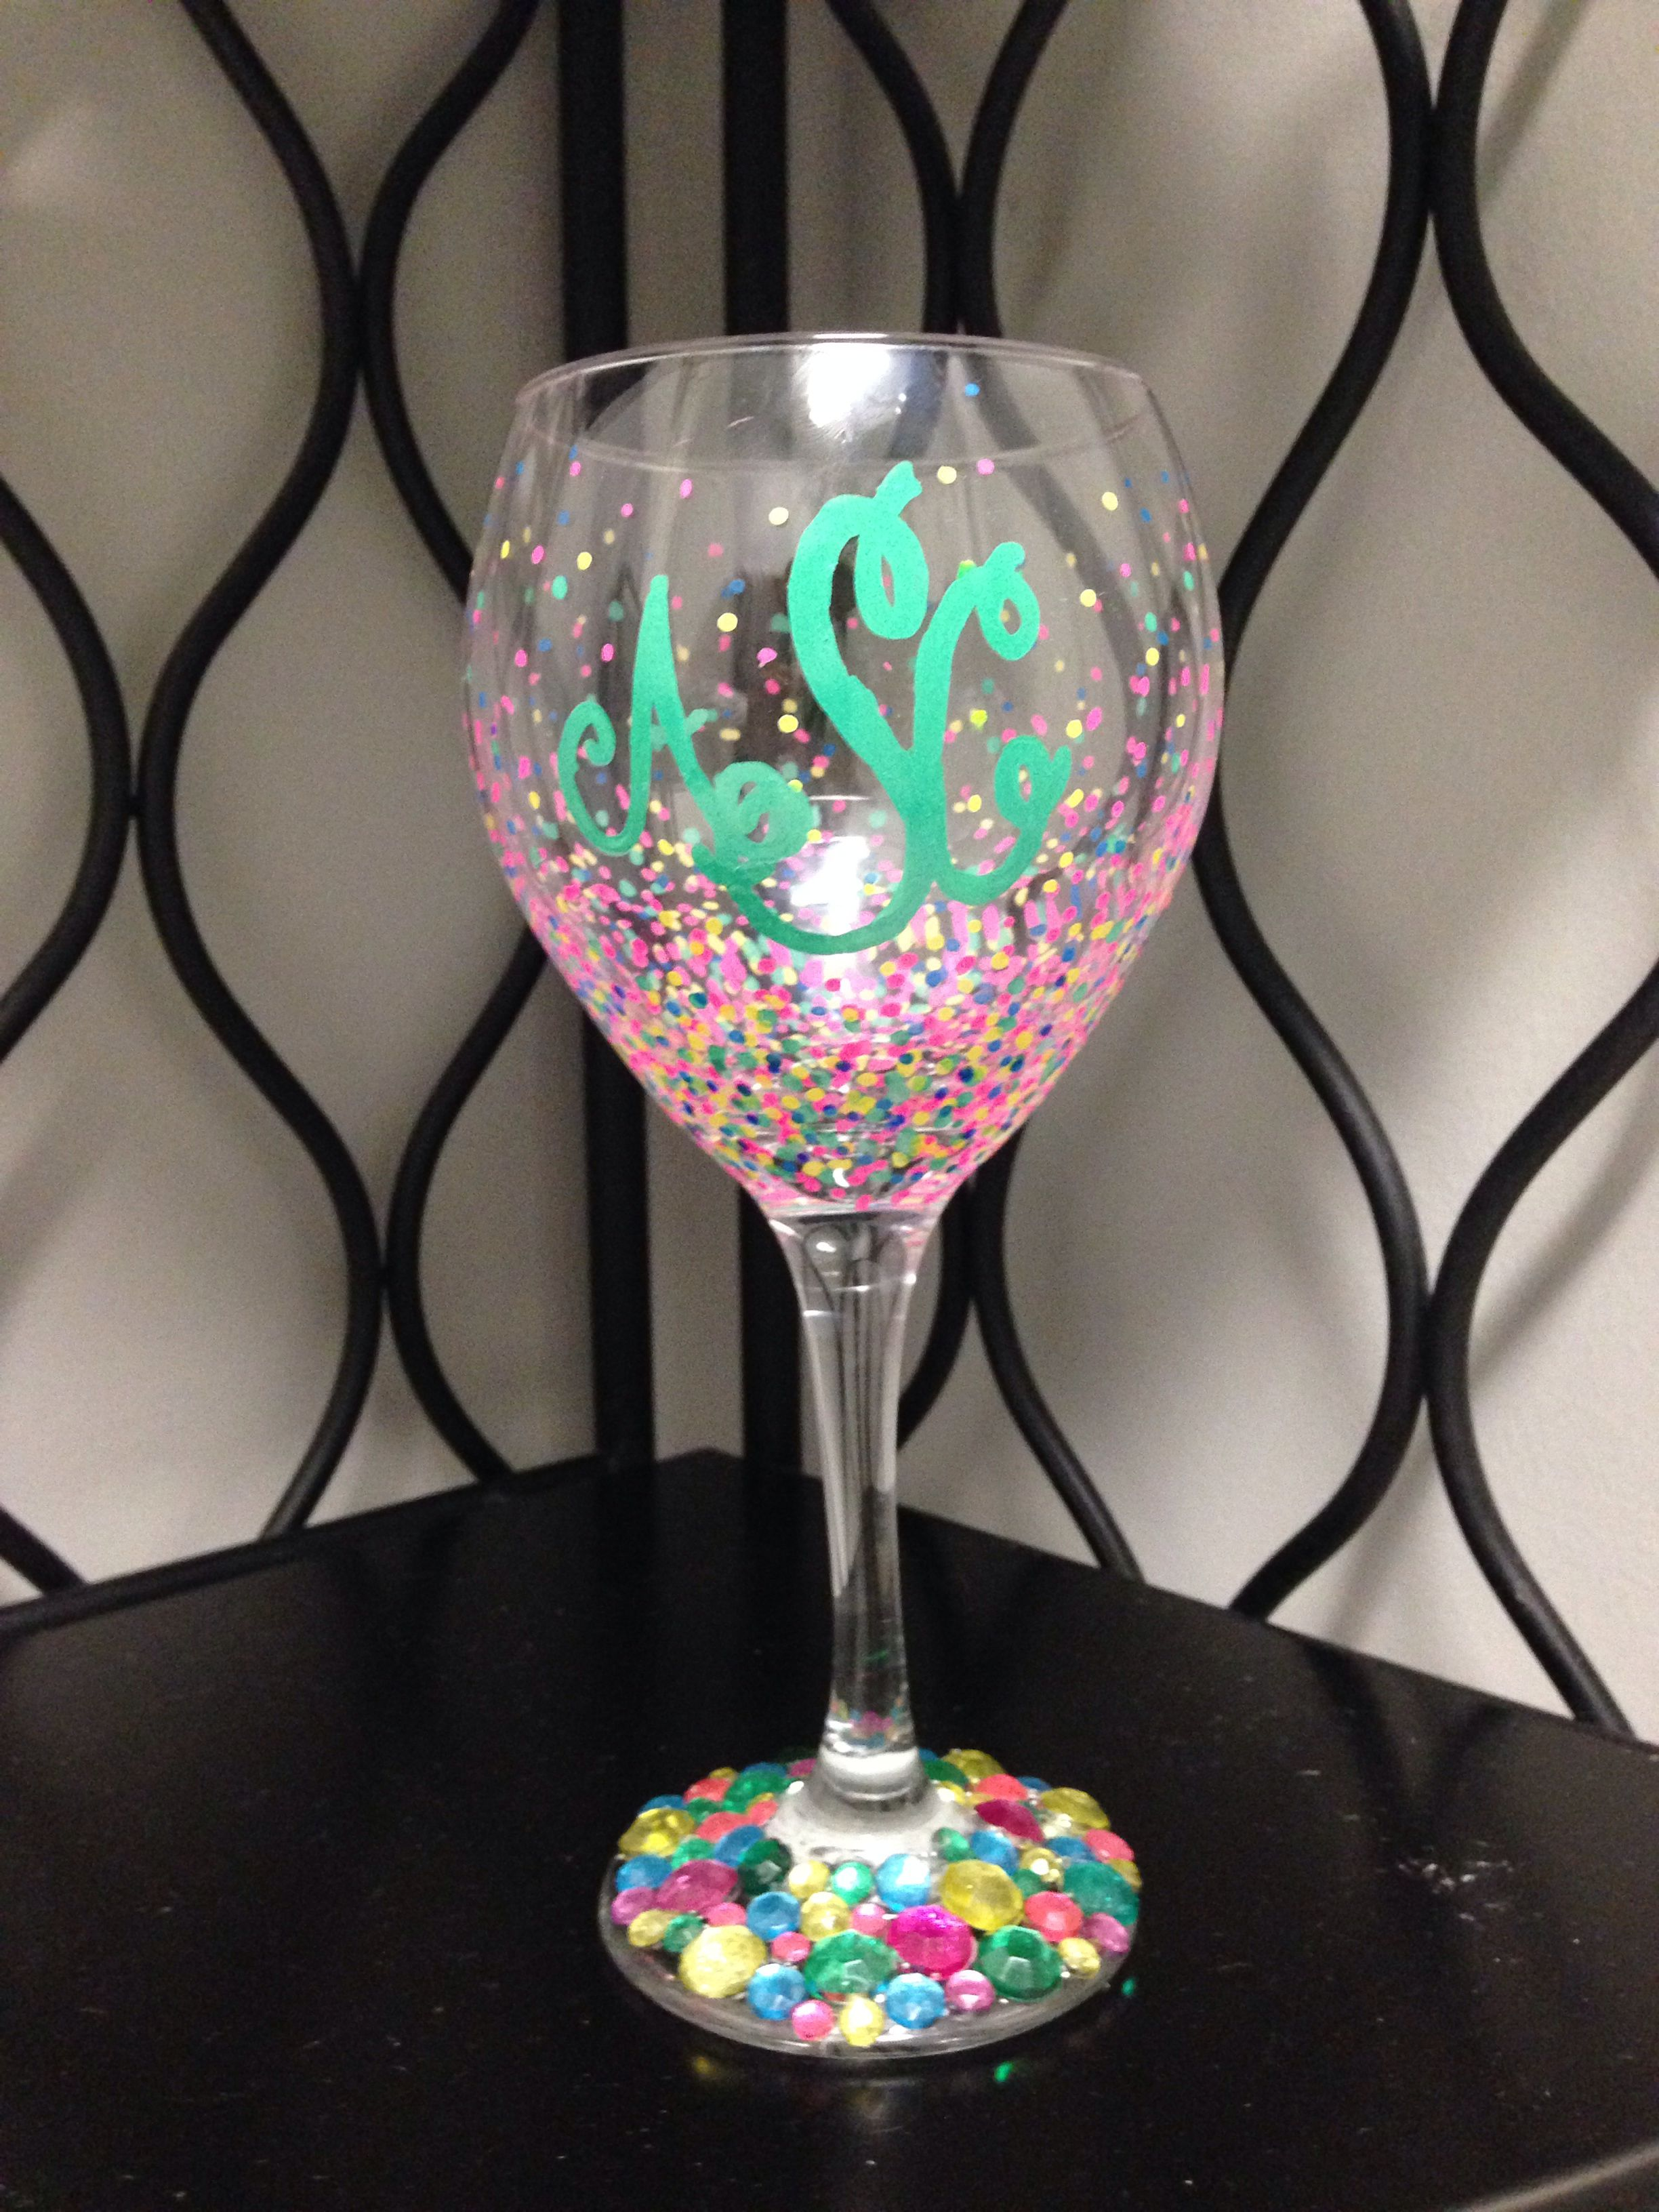 Permalink to Zeta Painted Wine Glass Craft